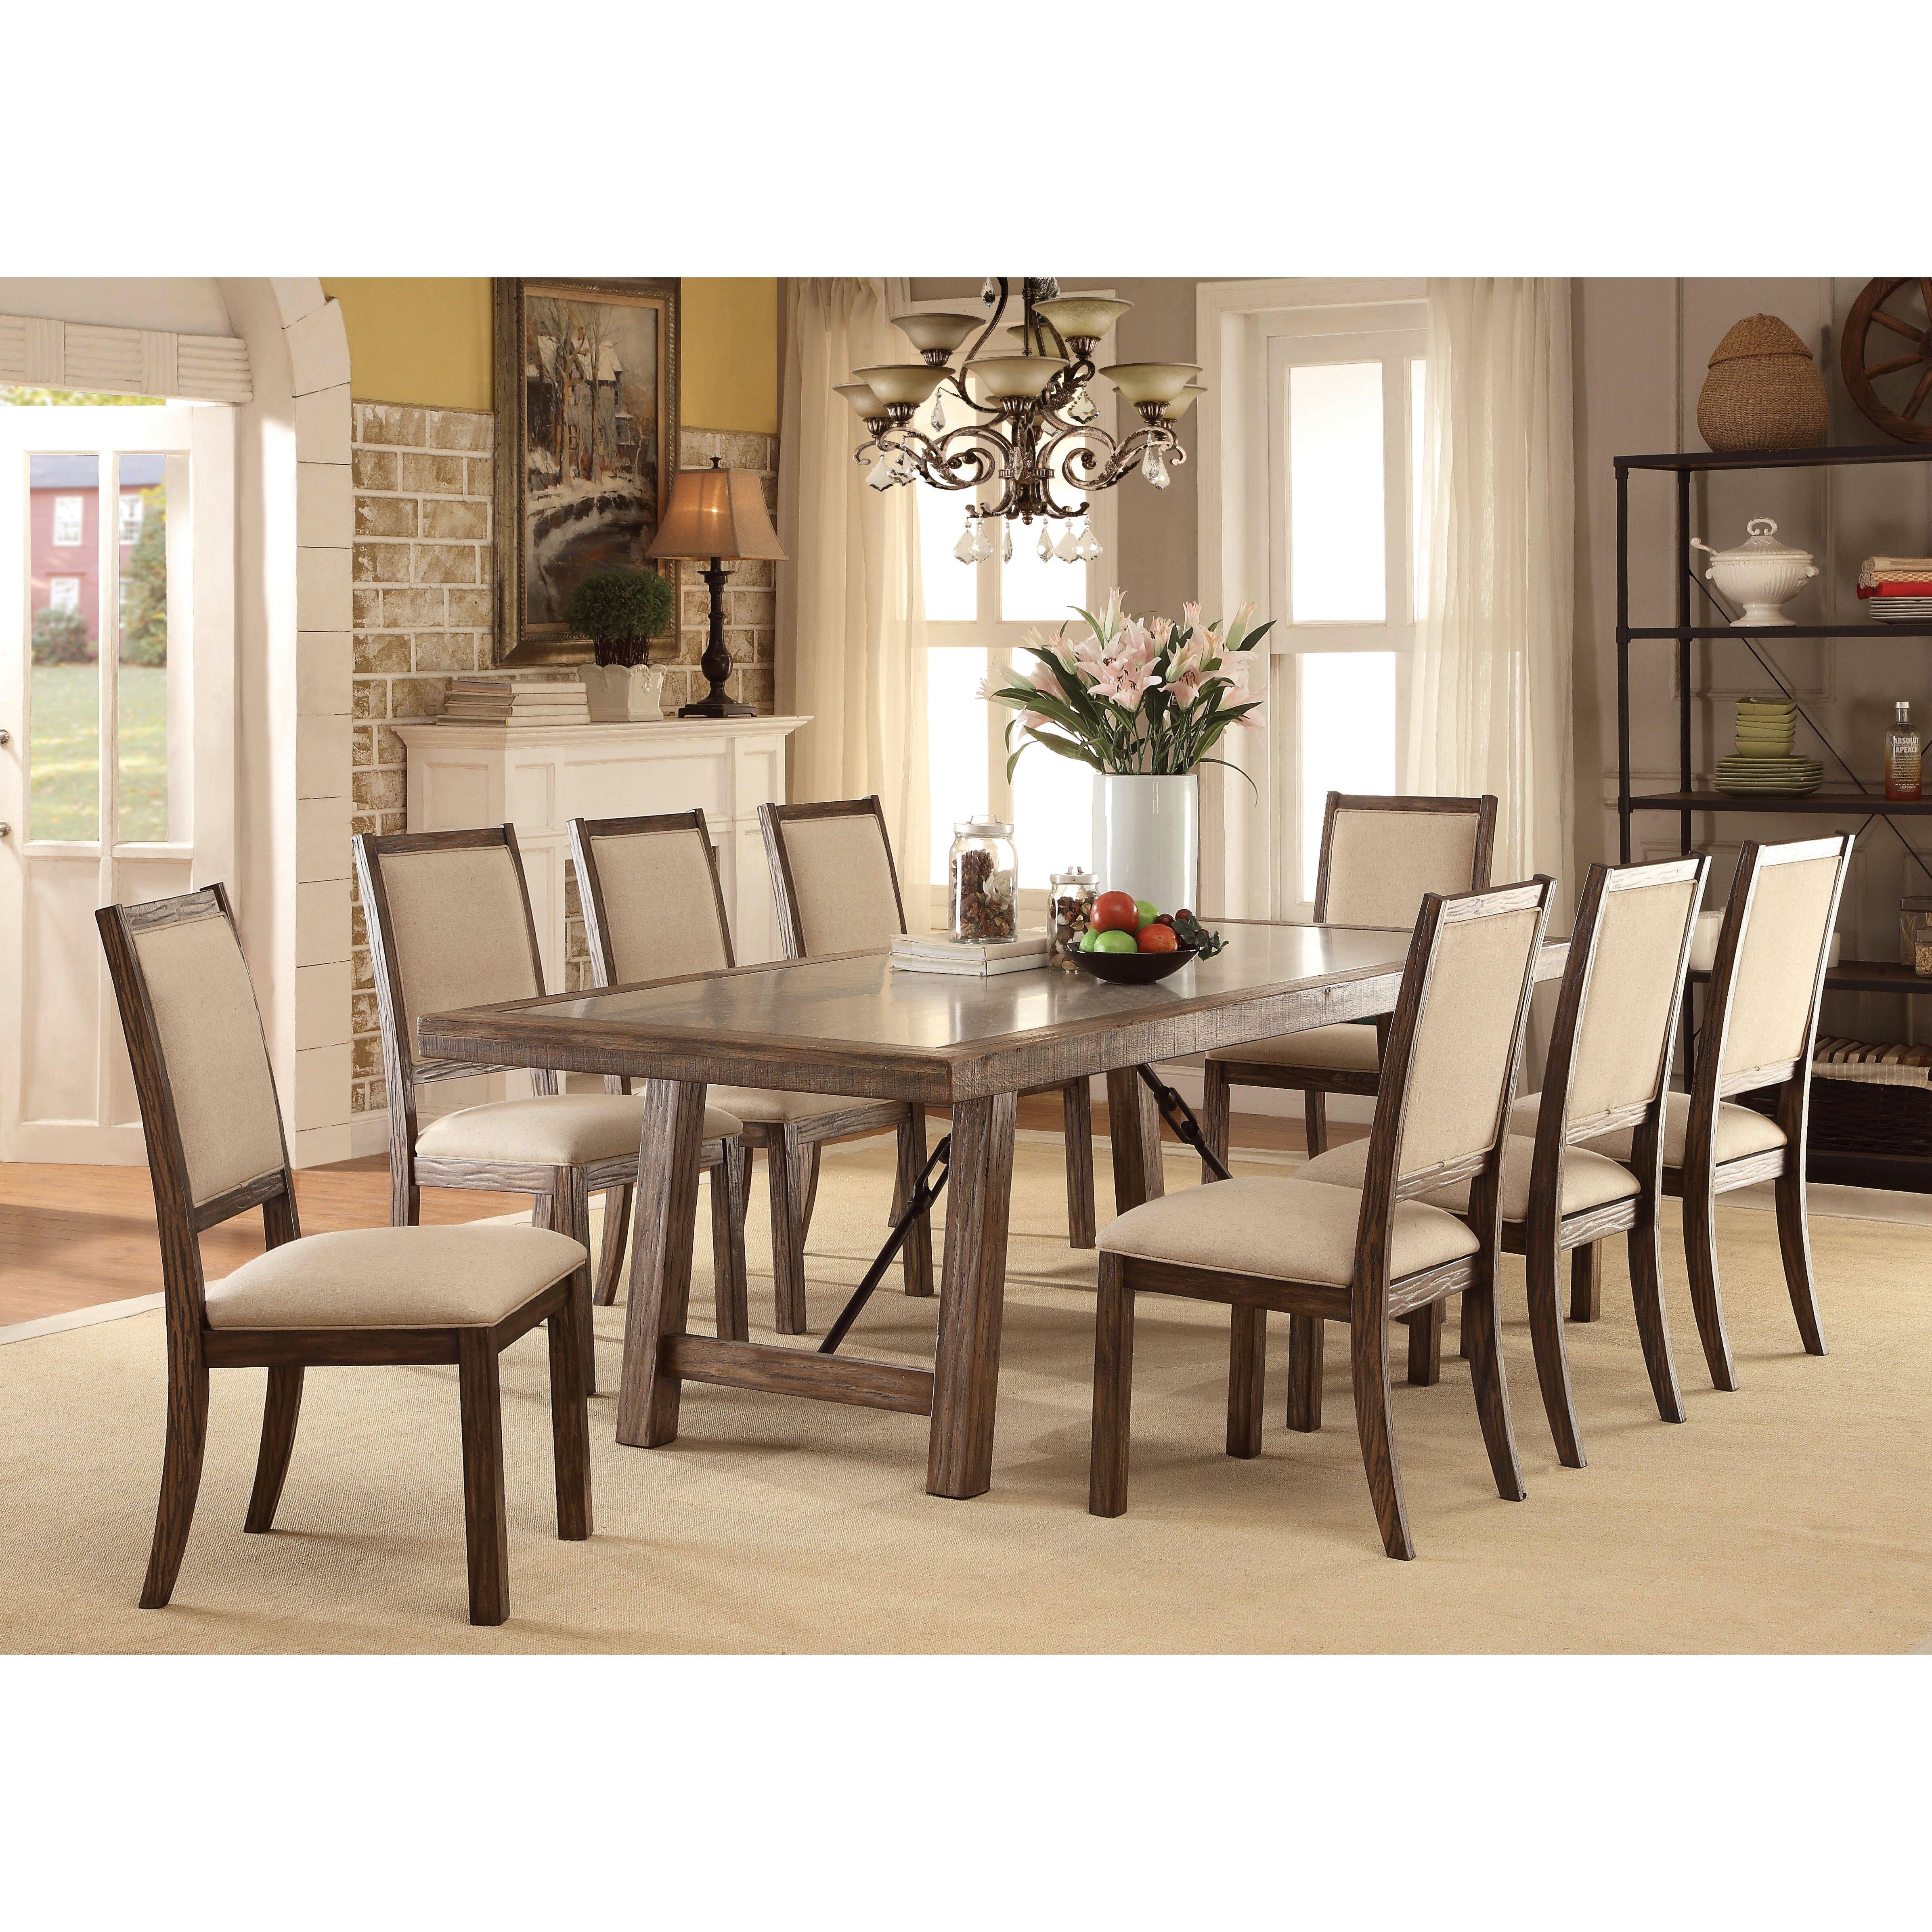 9 piece dining room table sets | Vienzo 9 Piece Dining Set | Wayfair